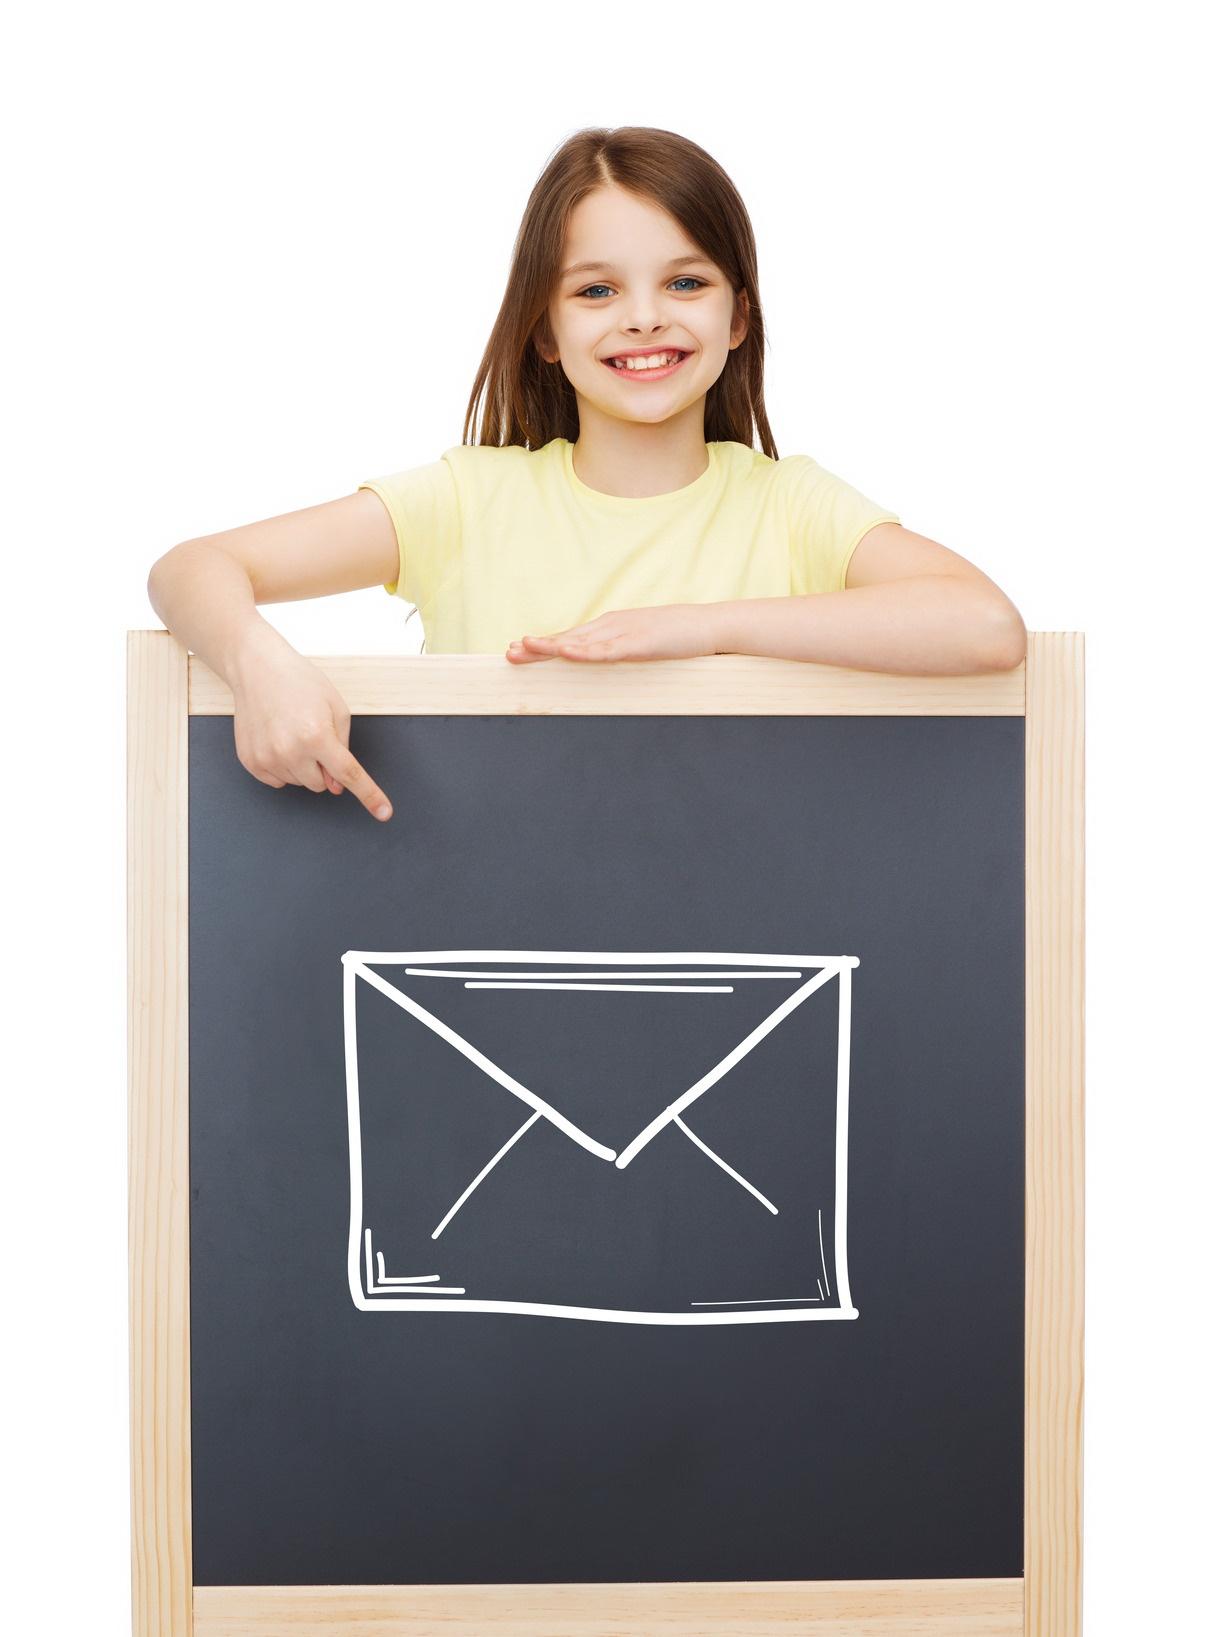 Youve_got_mail.jpg